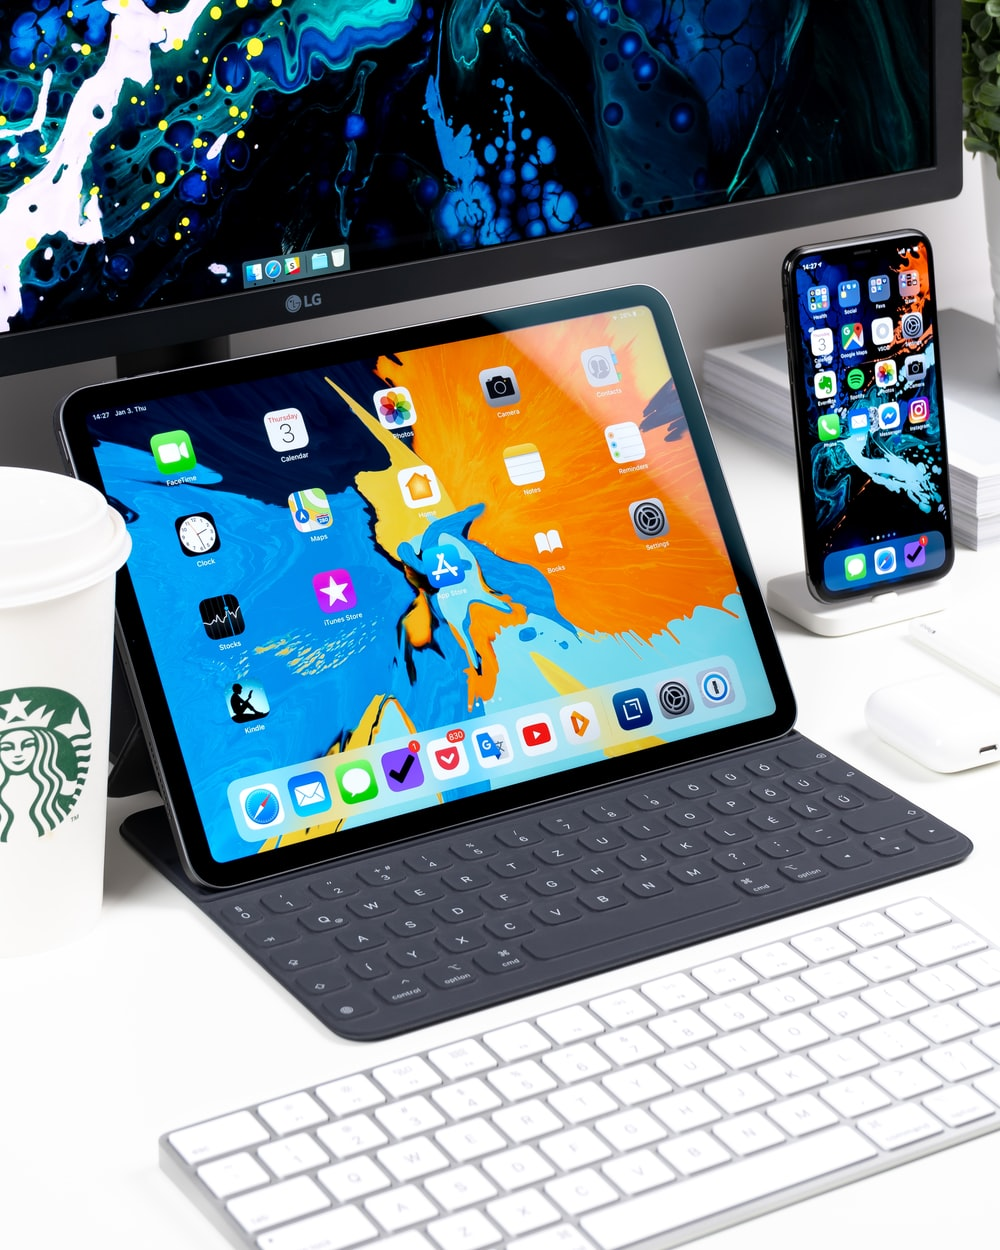 black iPad near the white keyboard